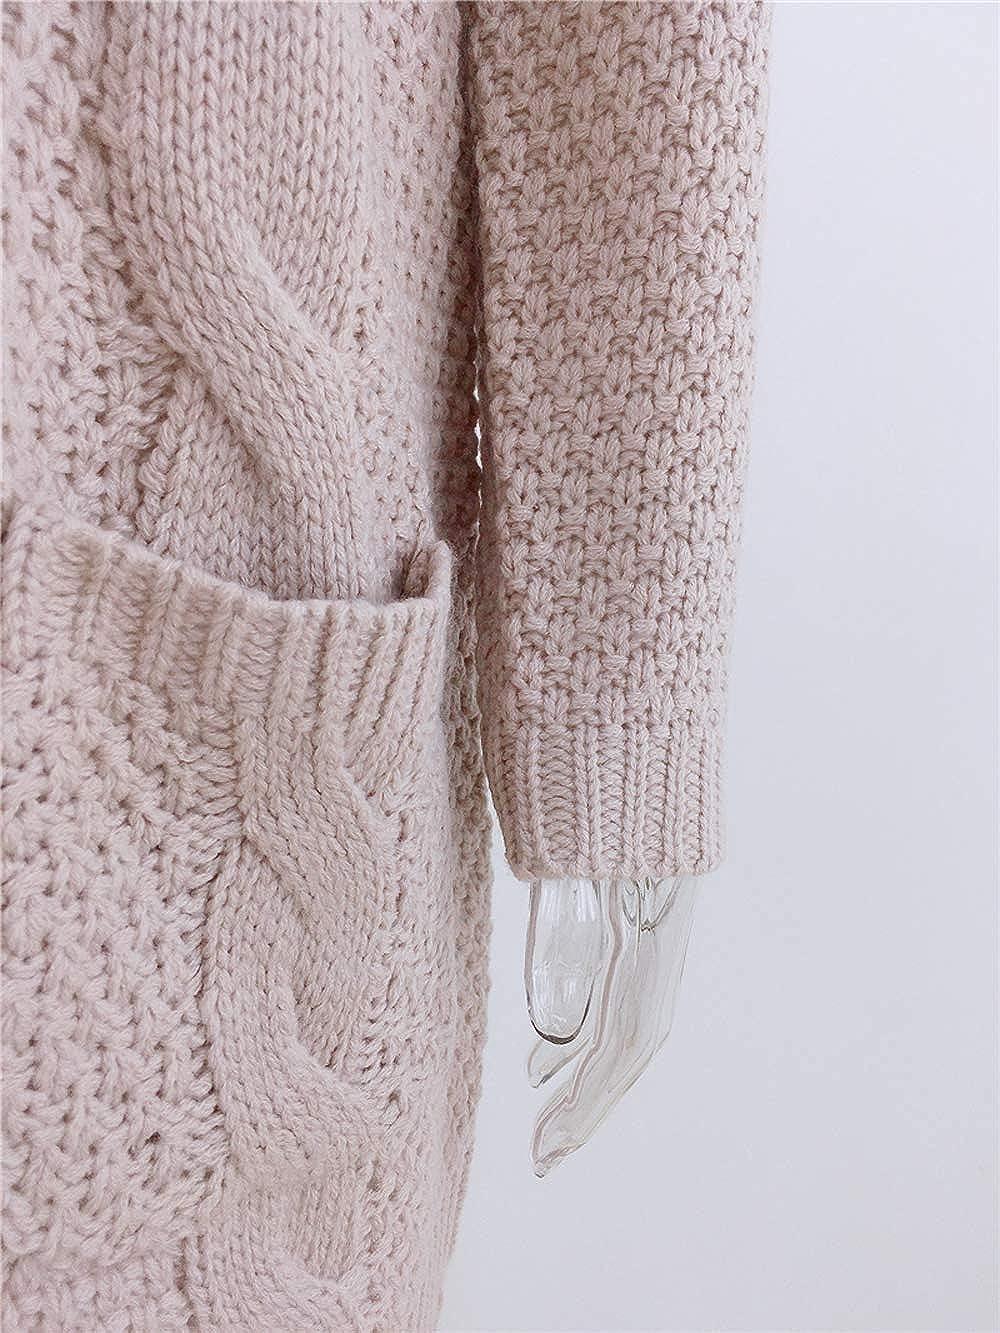 Damen Strickjacke Cardigan Lang Langarm V Ausschnitt mit Knopf Strickpullover Tops Outerwear Strickmantel lang C- Khaki